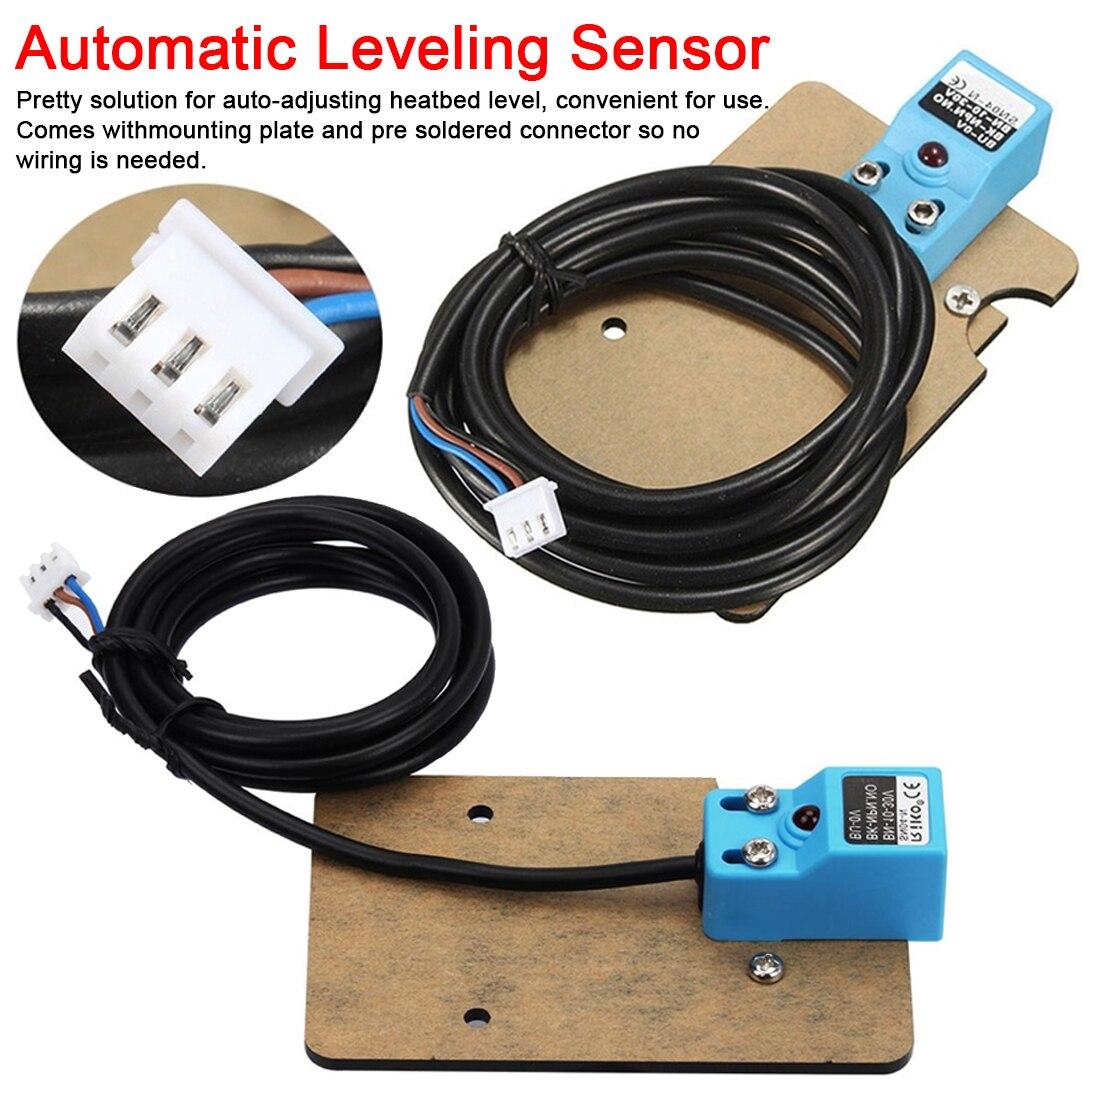 1 Set of Automatic Leveling Position Sensor 3D Printer Part Accessories for Anet A8 1.75mm pla filament